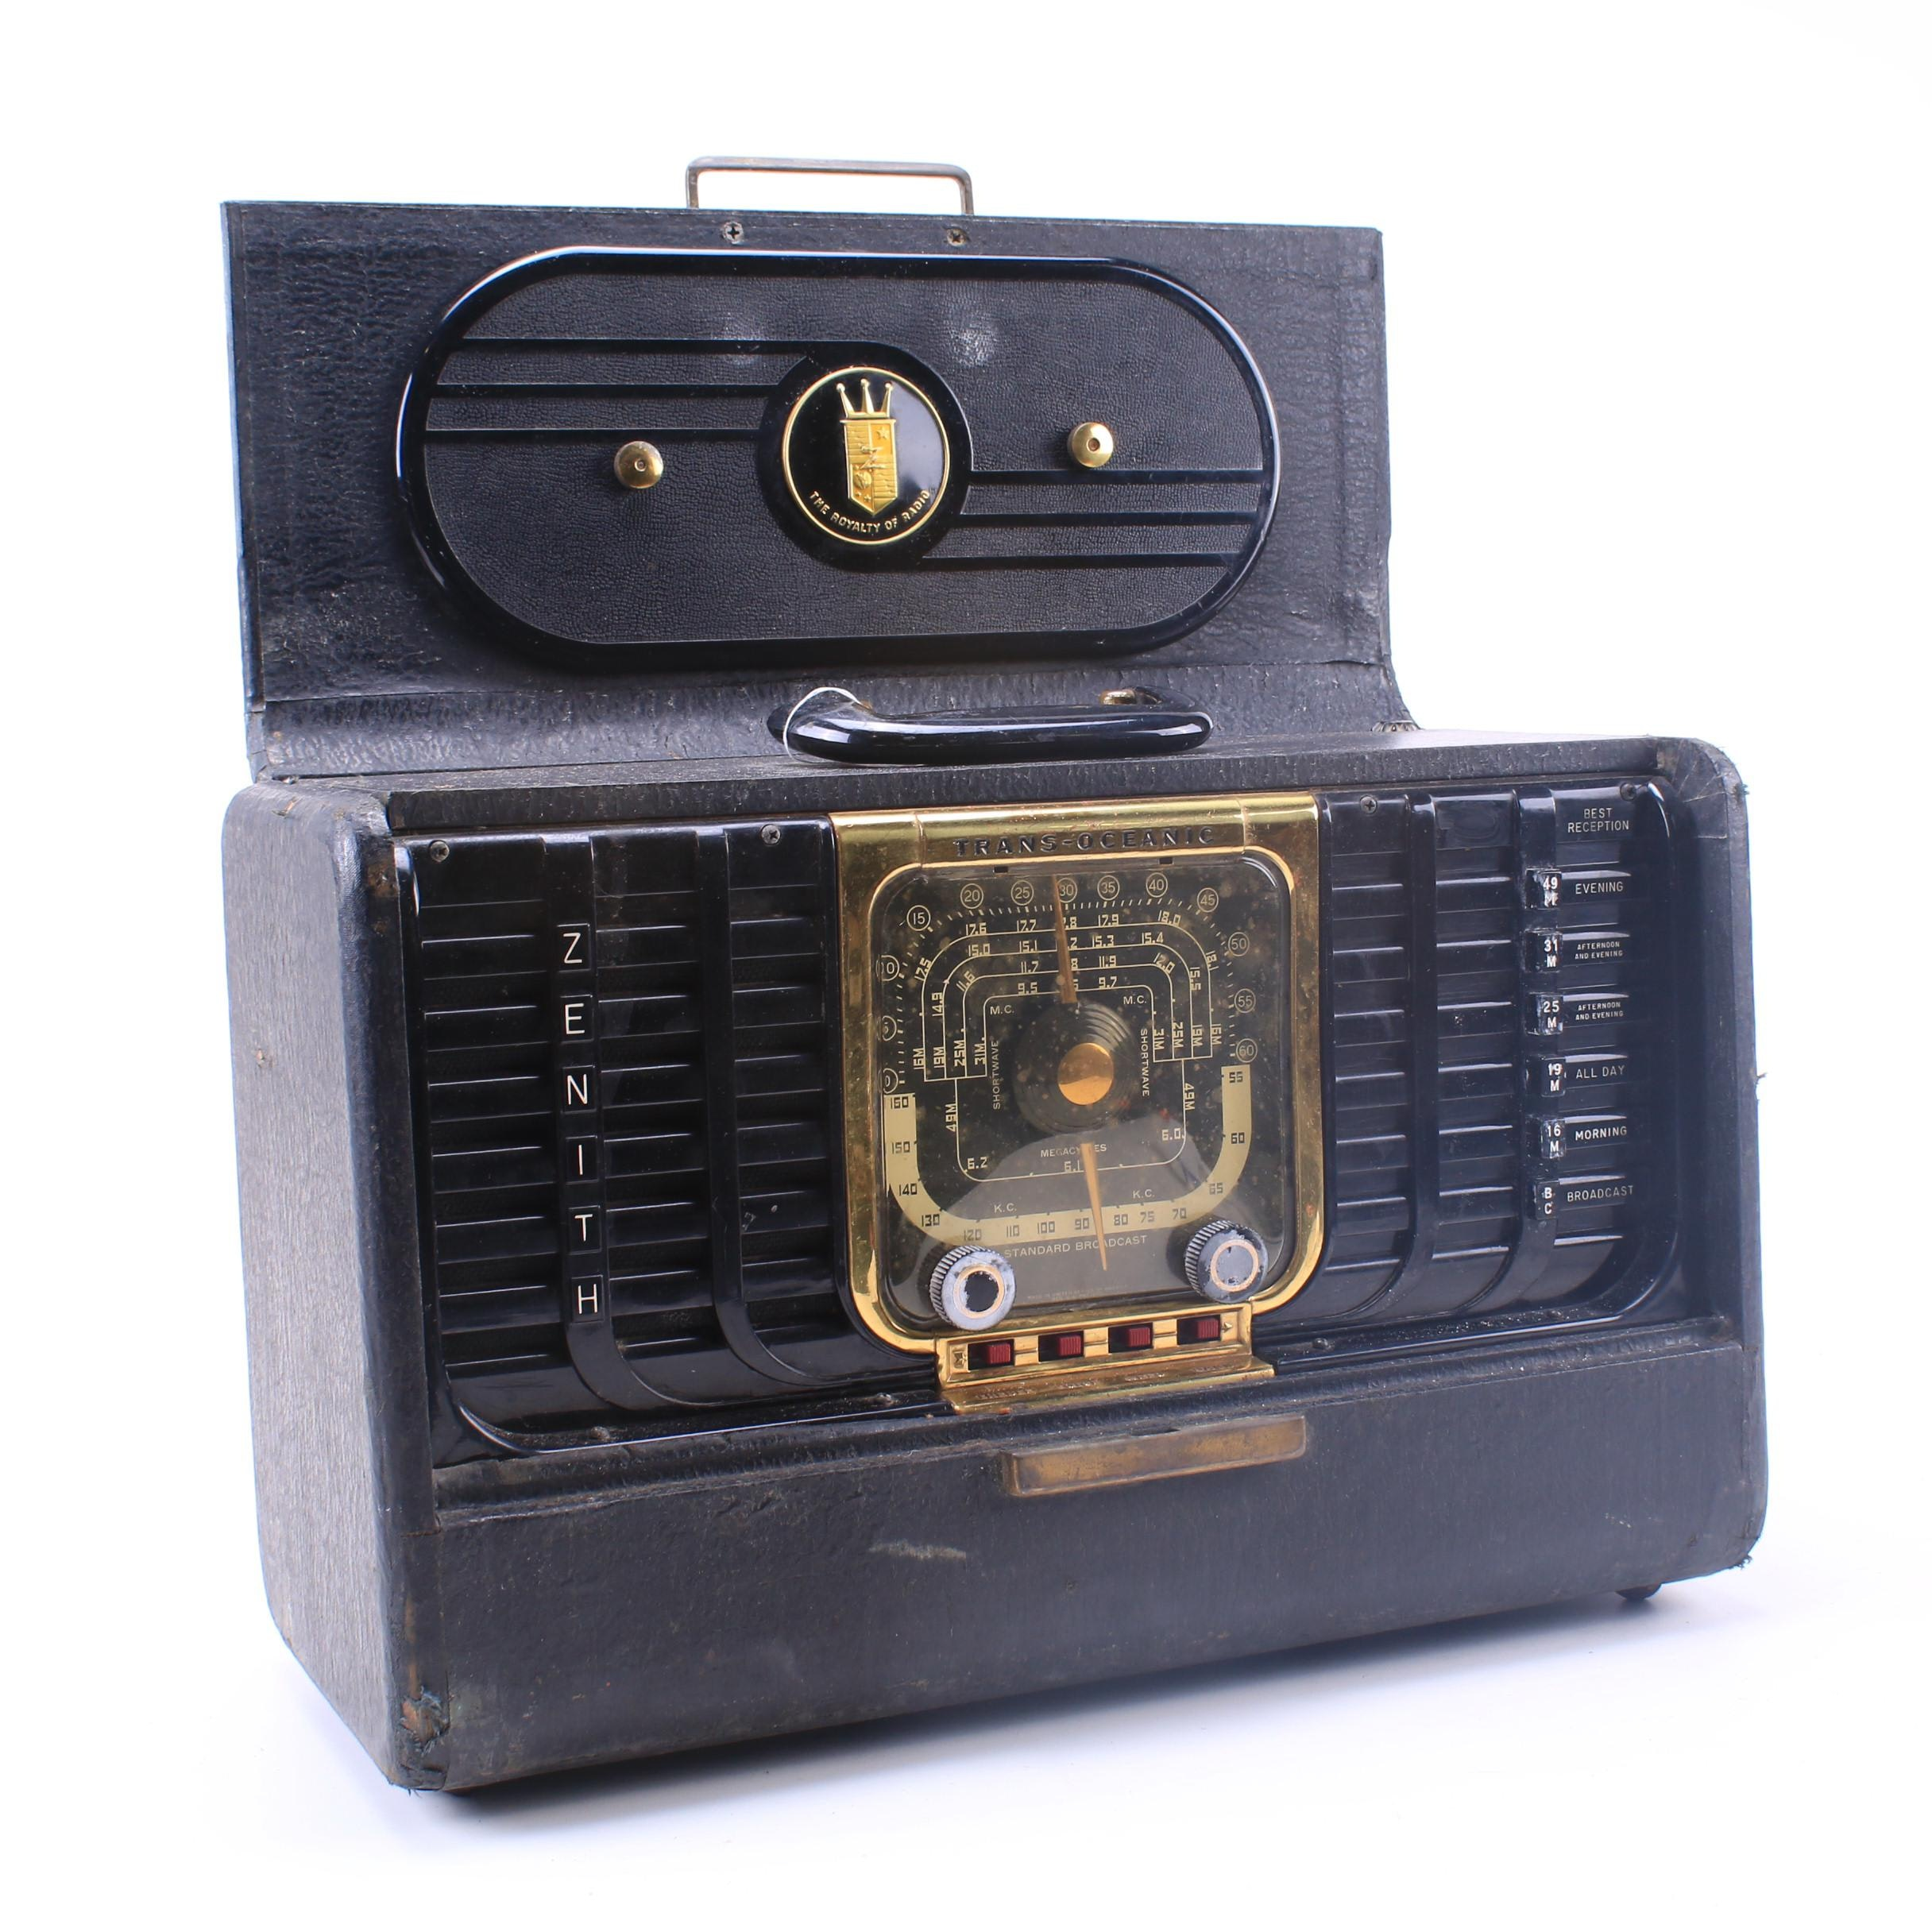 Zenith G500 TransOceanic Radio